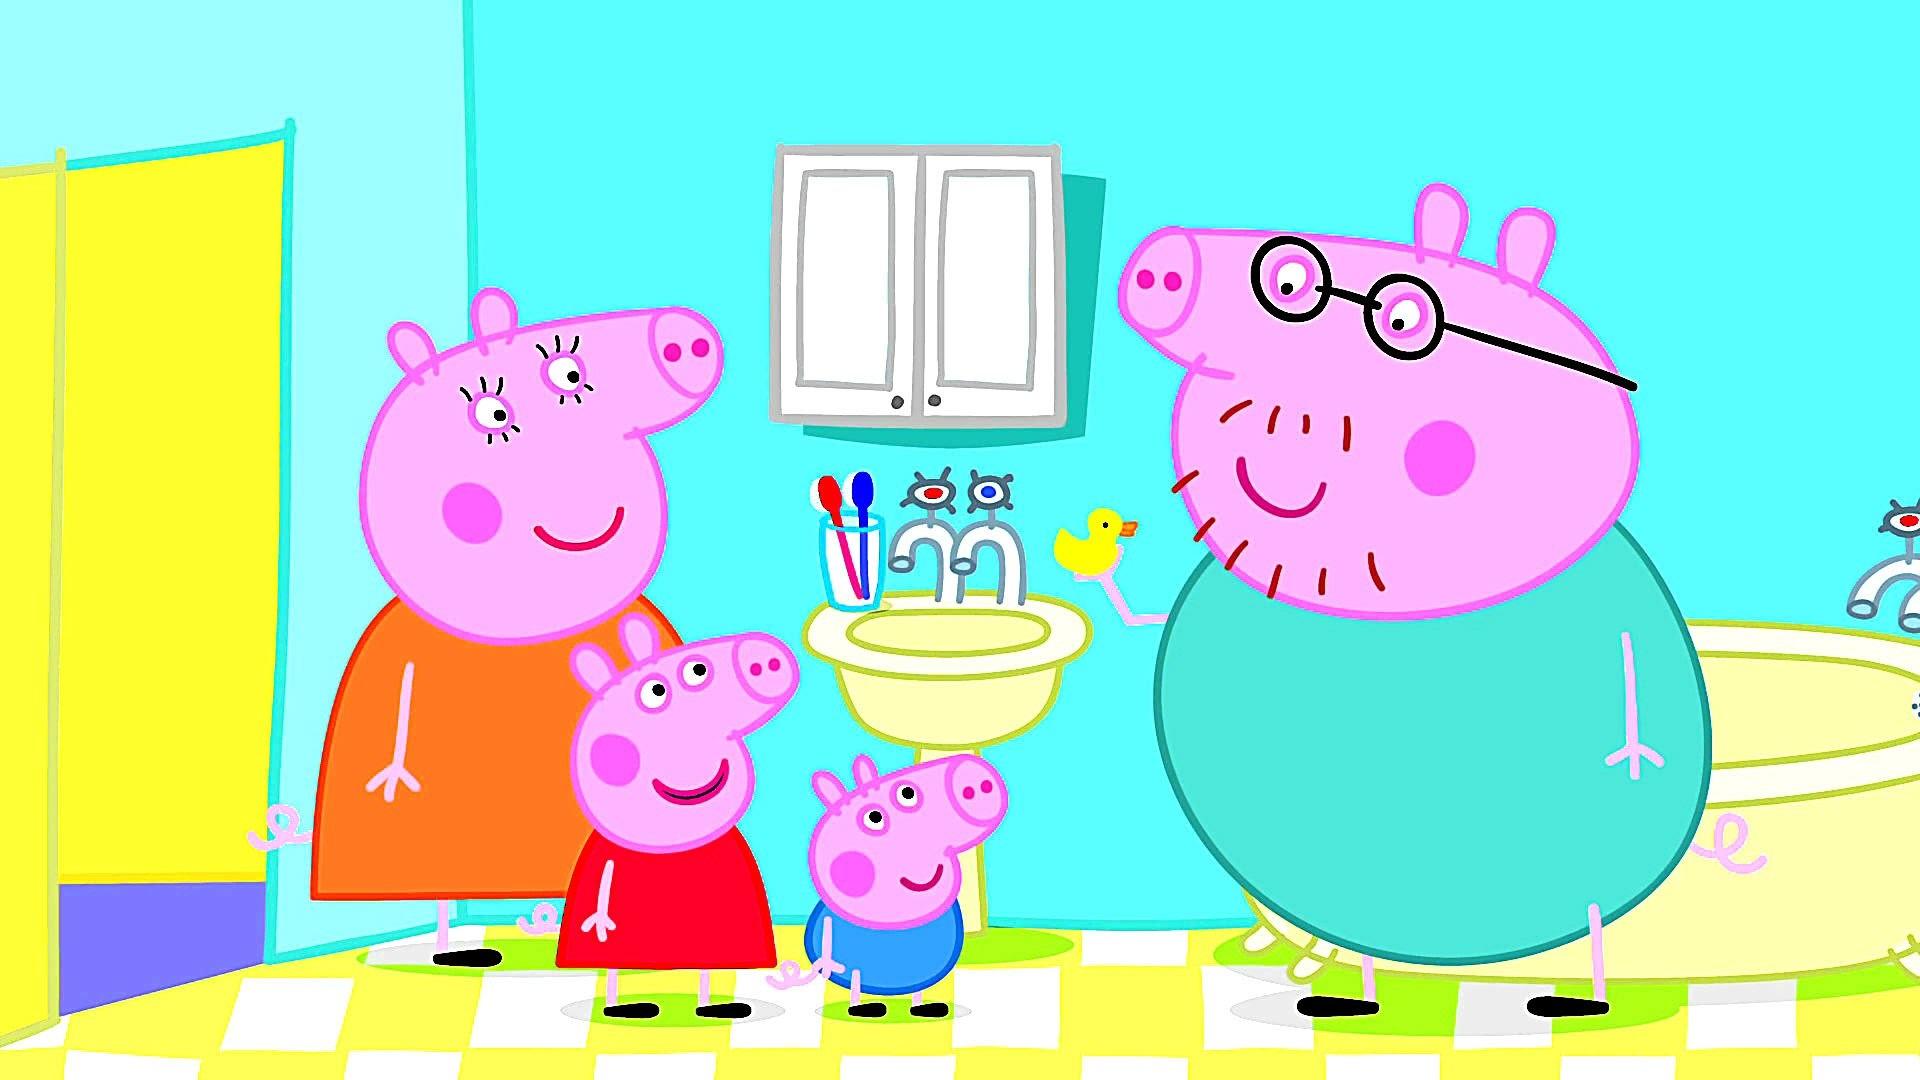 Peppa Pig HD Wallpaper (90+ images)